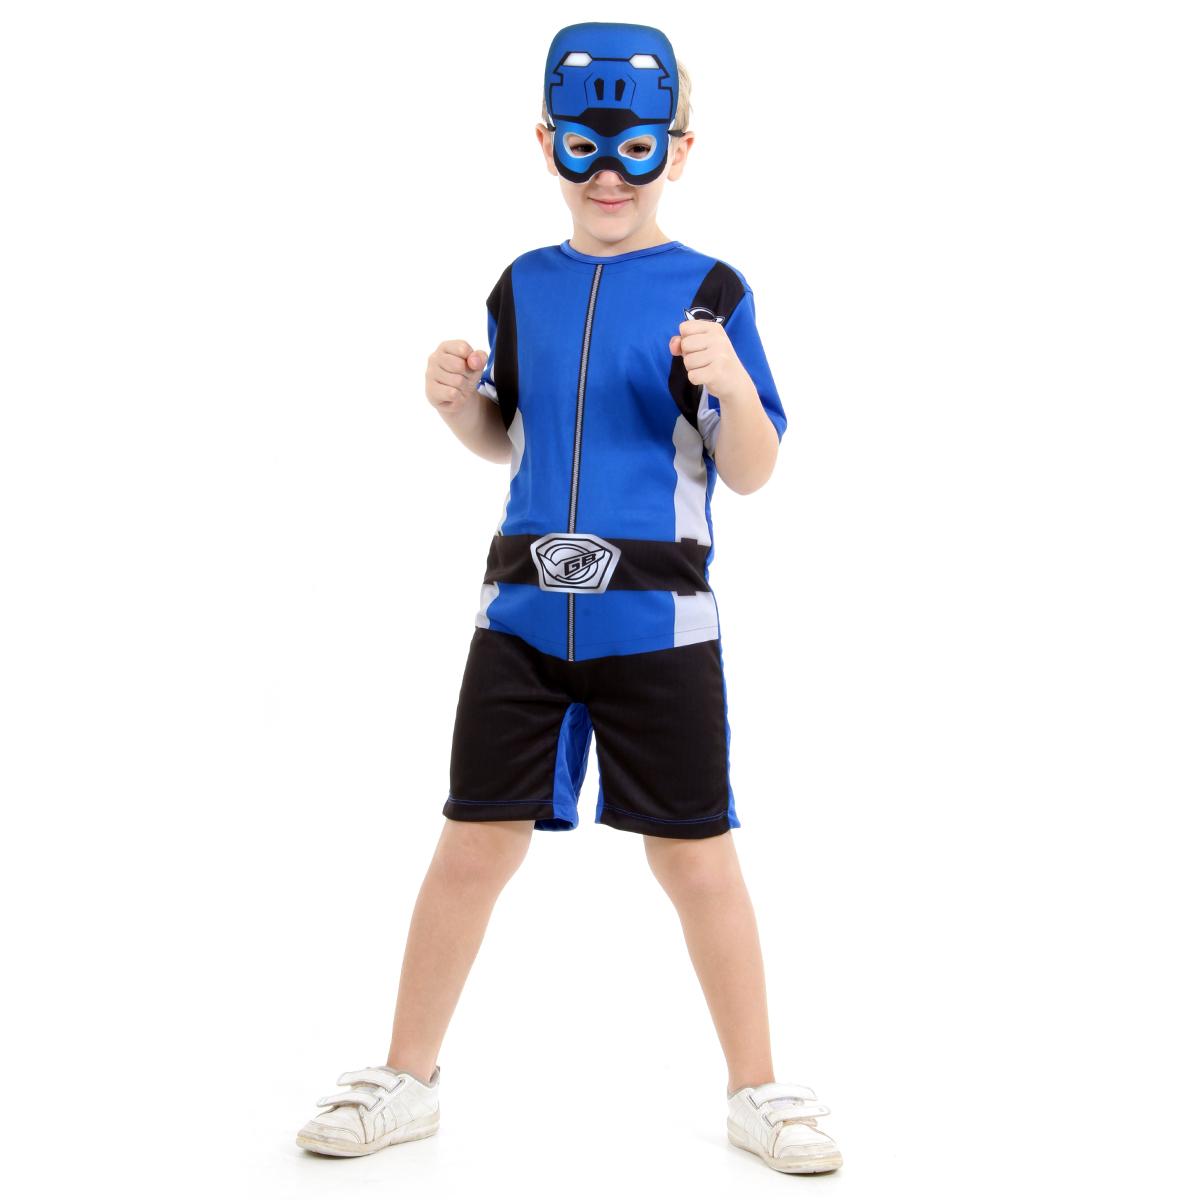 Fantasia Power Rangers Beast Morphers Azul Curto